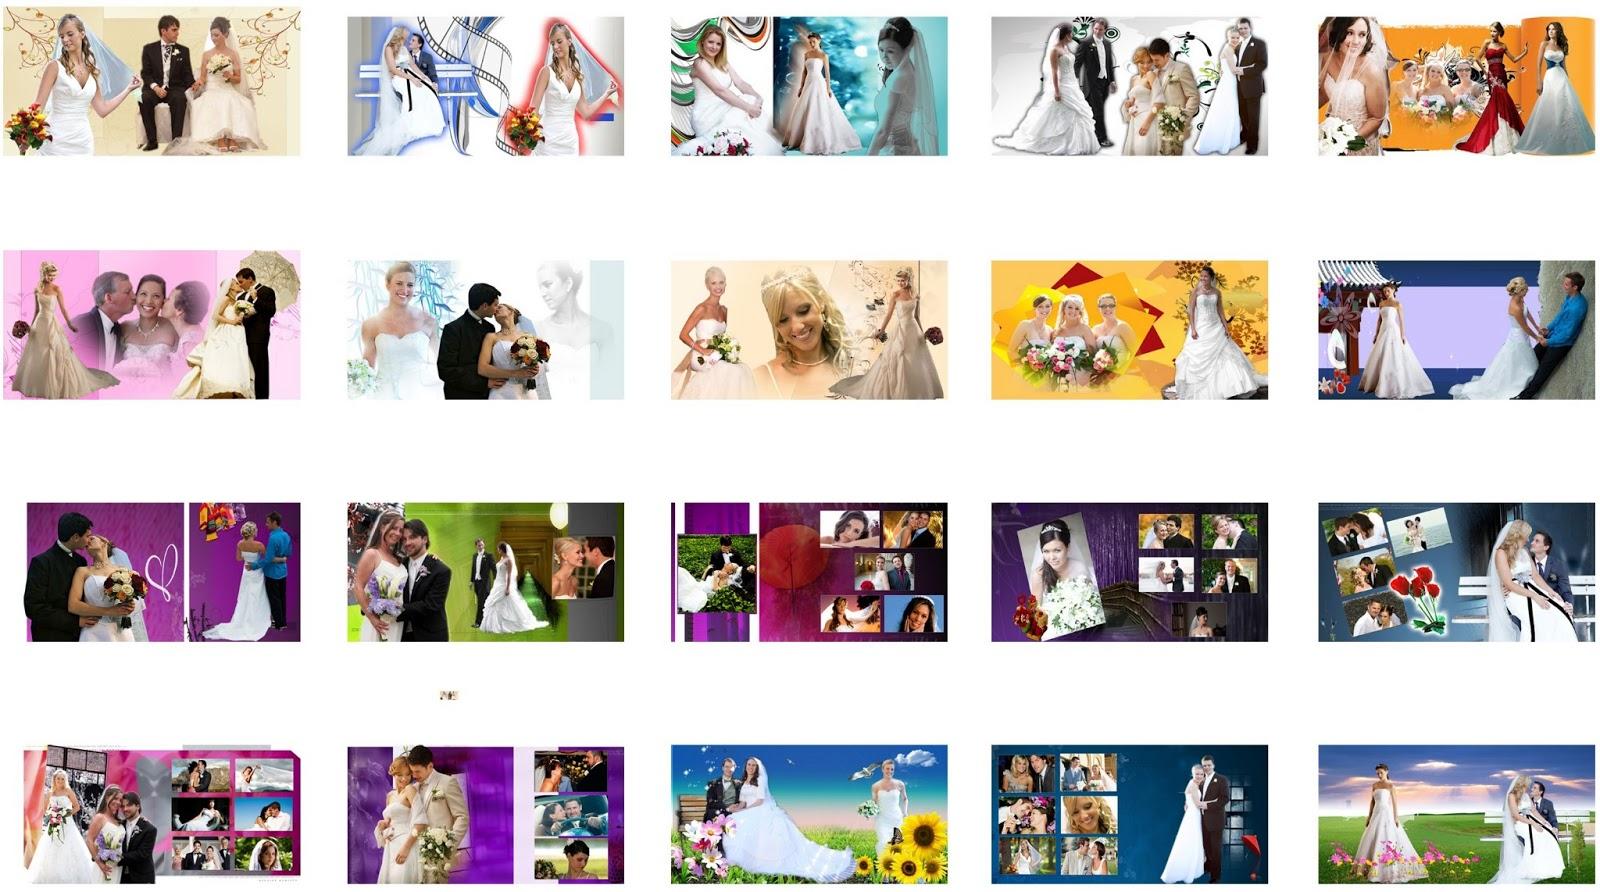 Photoshop Backgrounds: Western Wedding Album Design